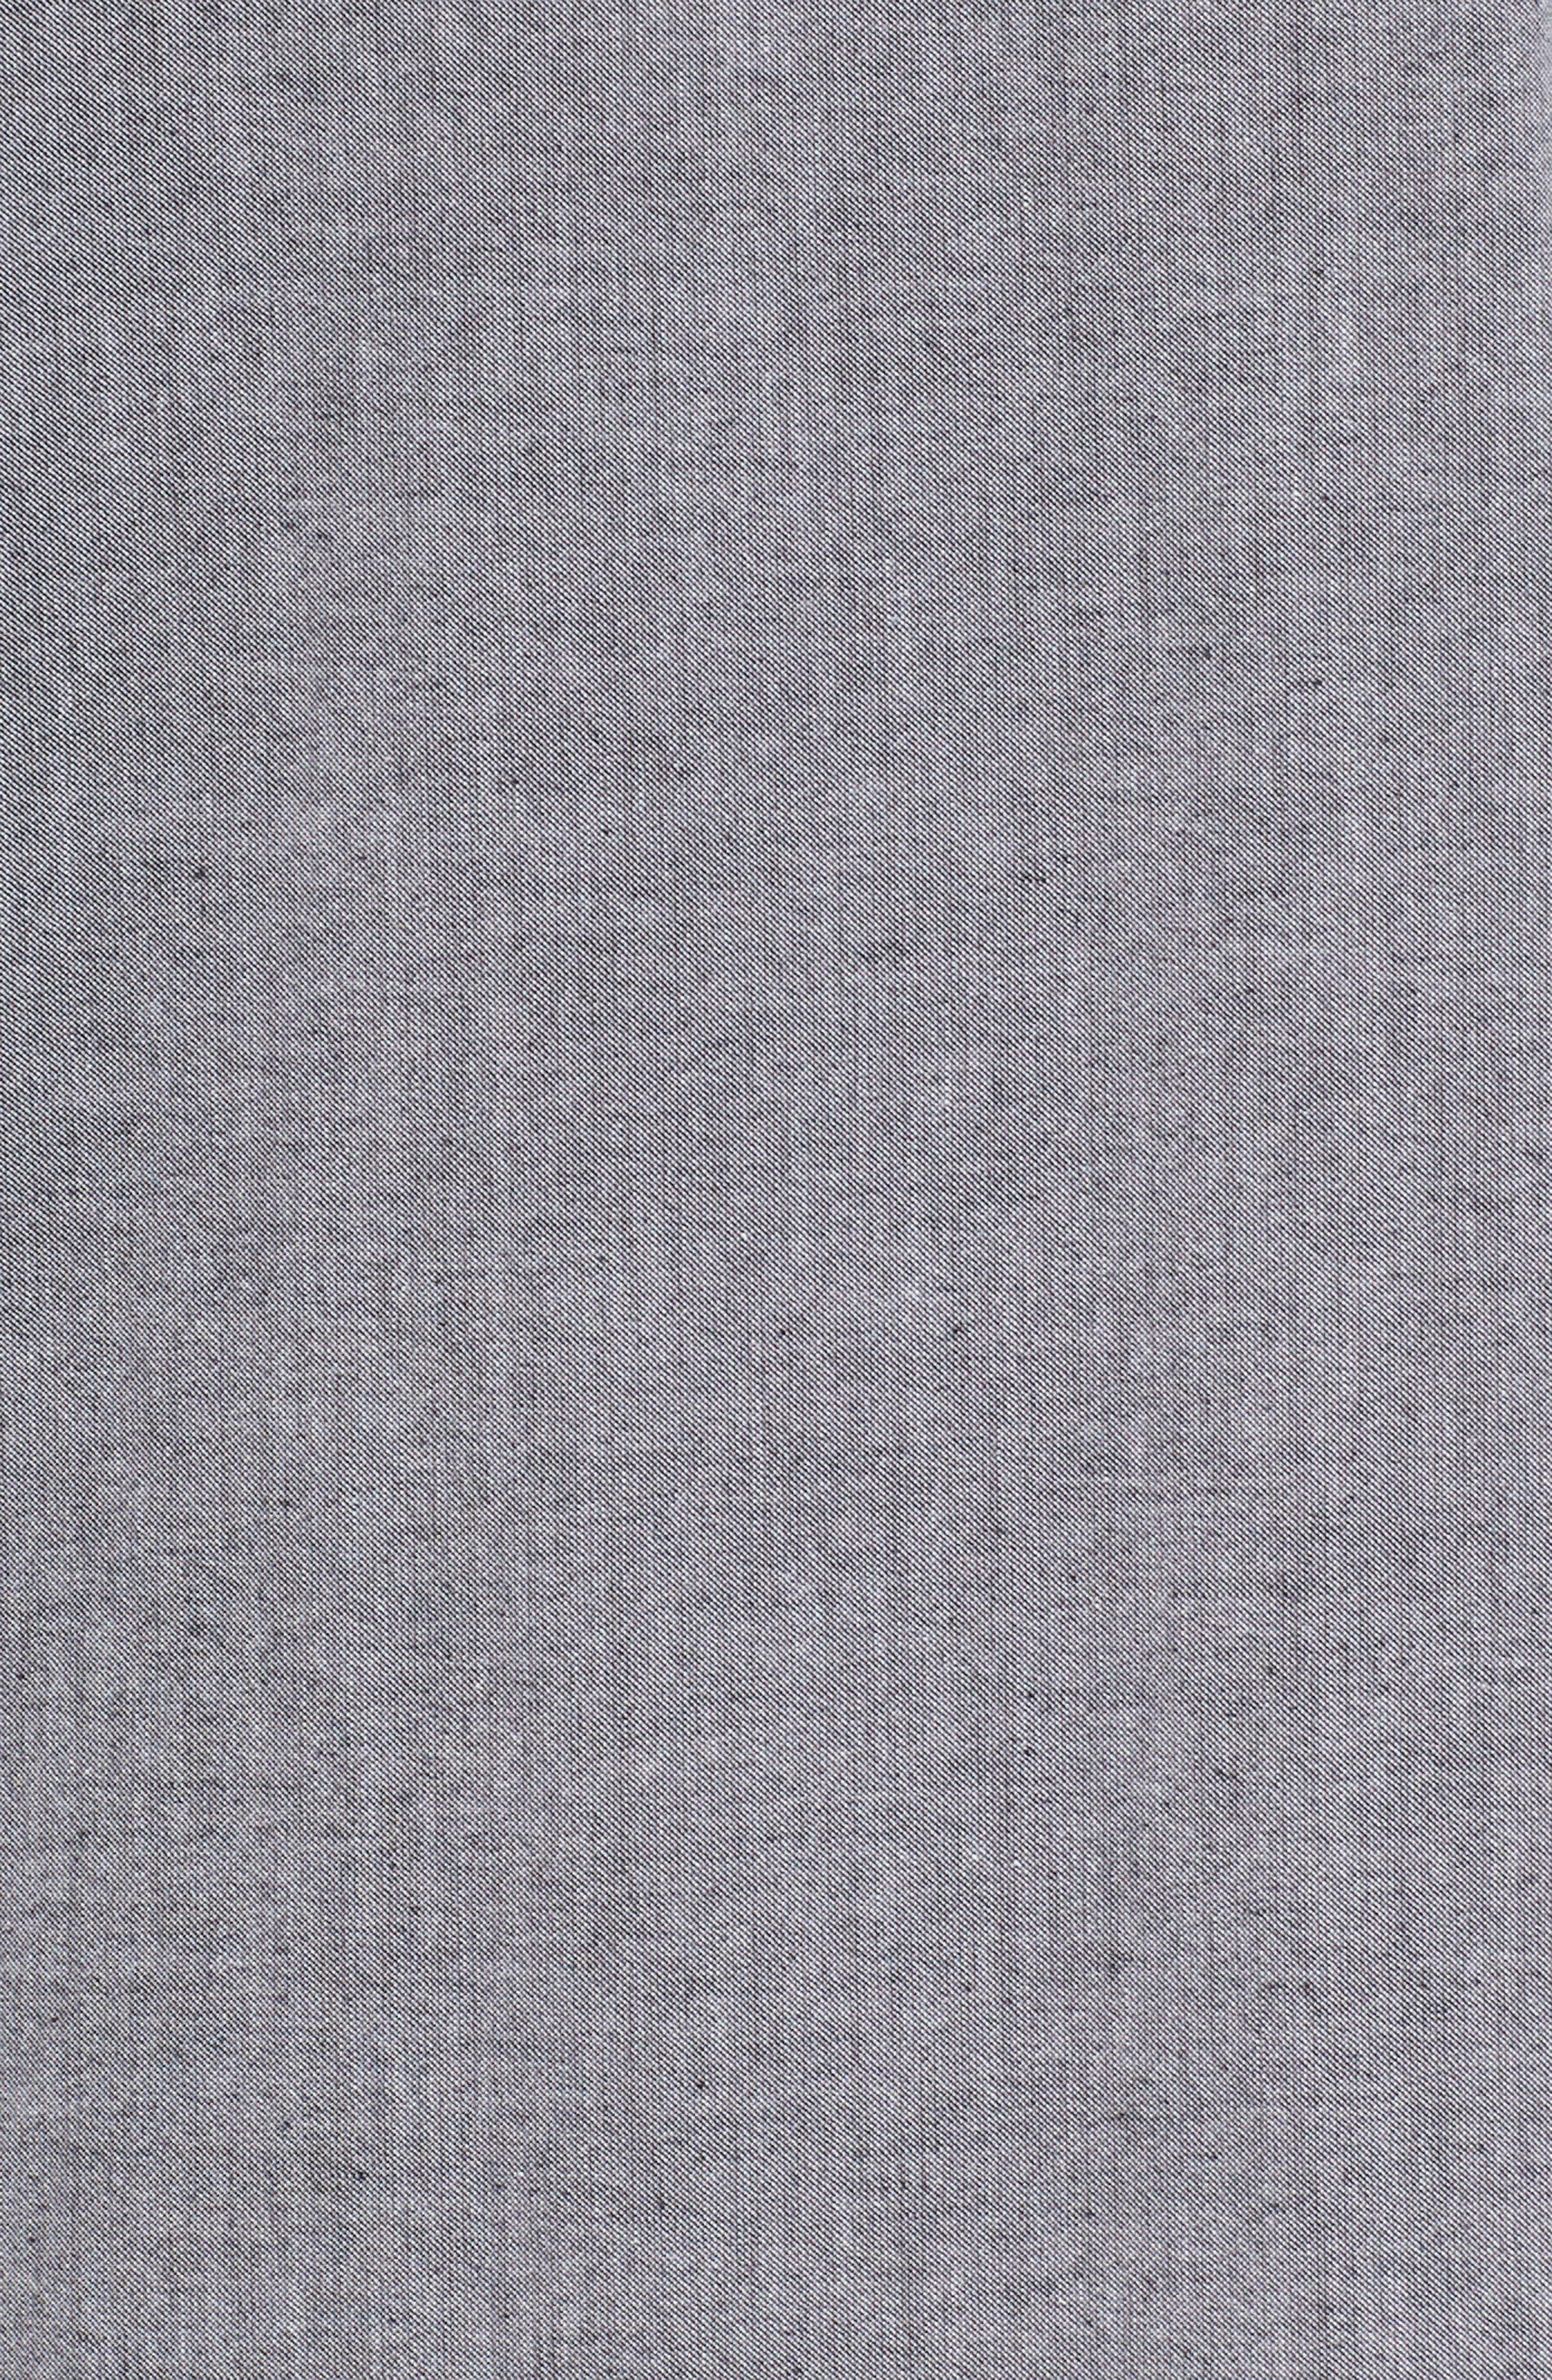 Sleep Shirt,                             Alternate thumbnail 5, color,                             027